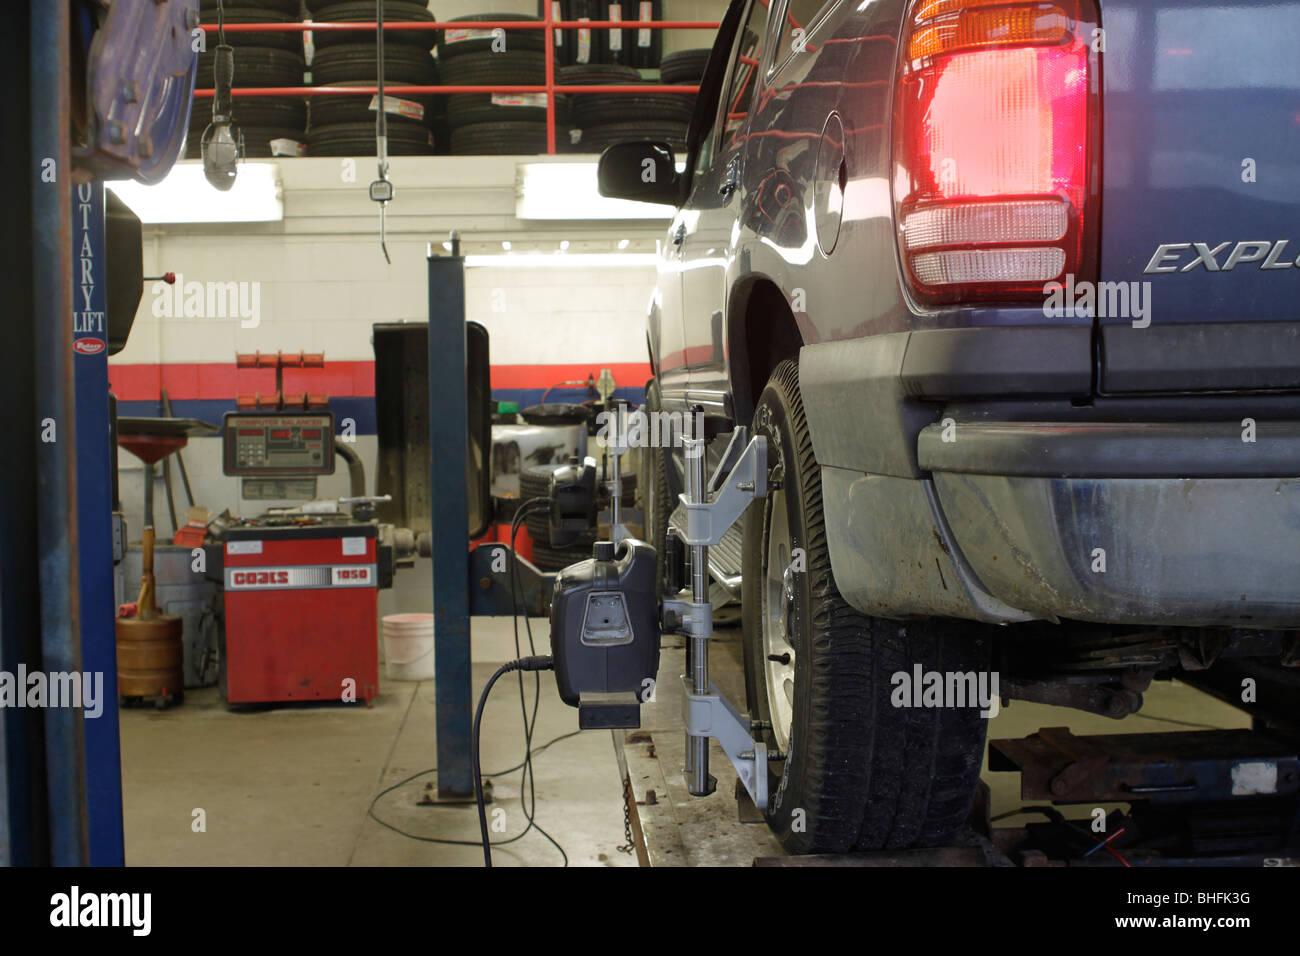 Wheel alignment in high tech auto service shop - Stock Image